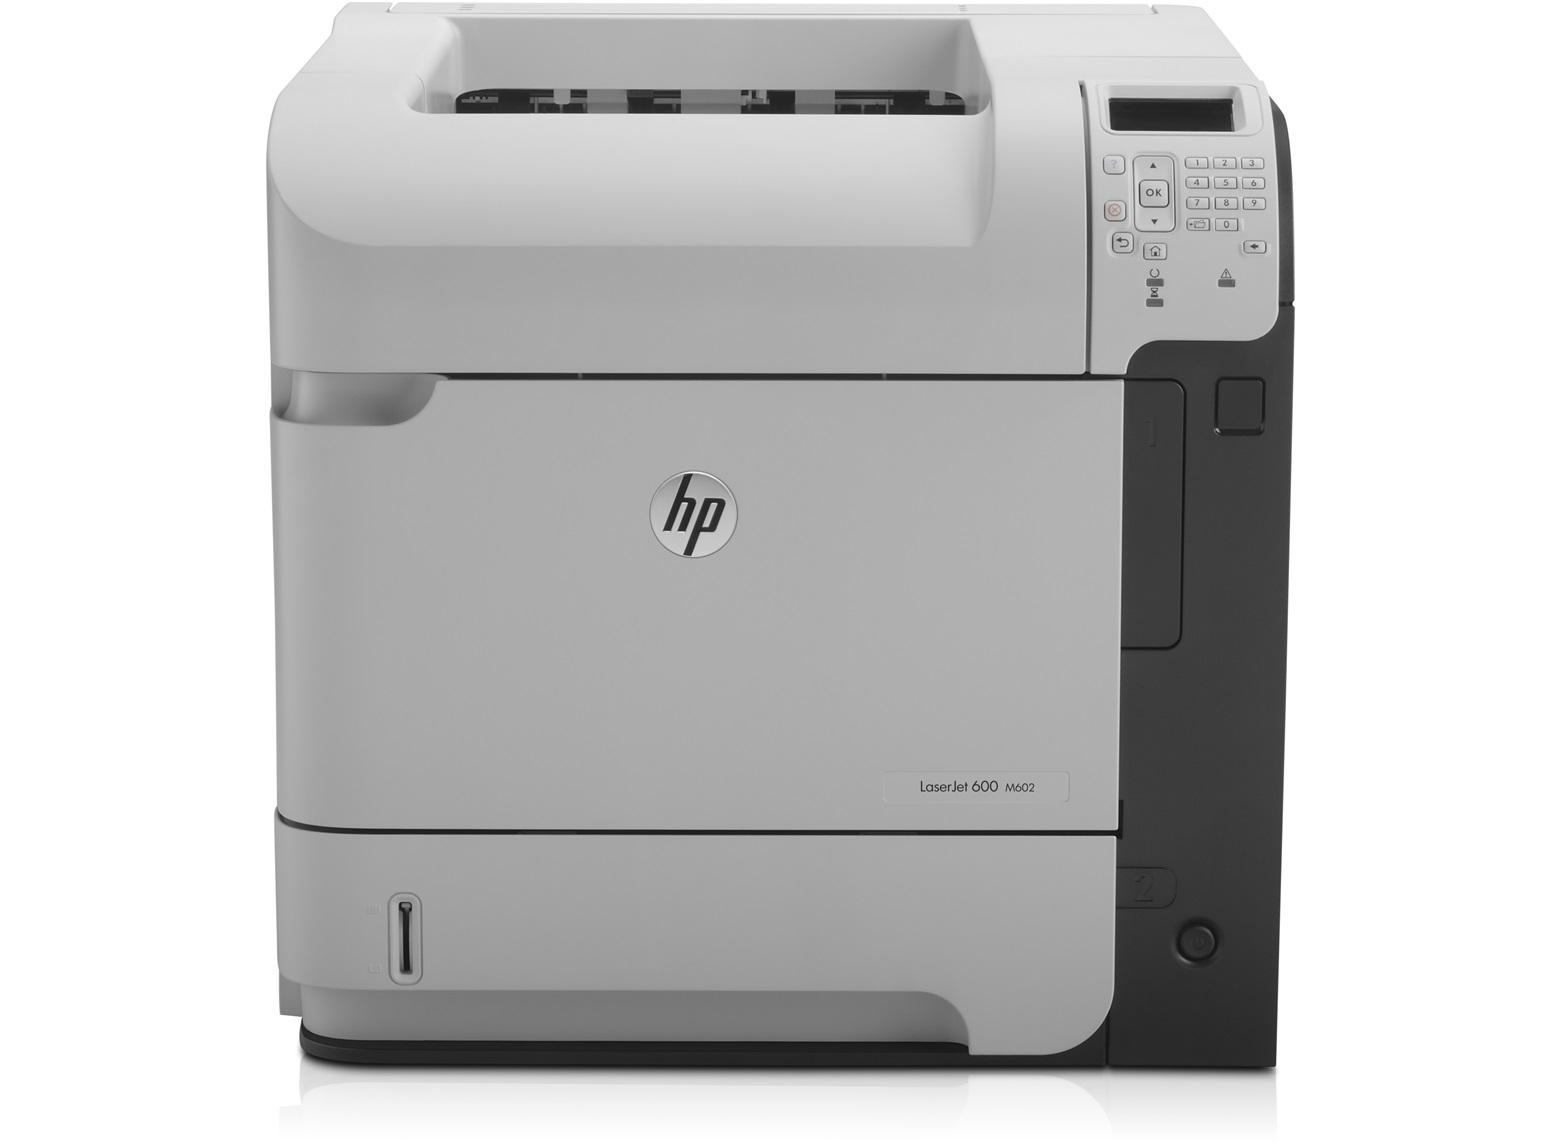 Laserjet 600 M602N